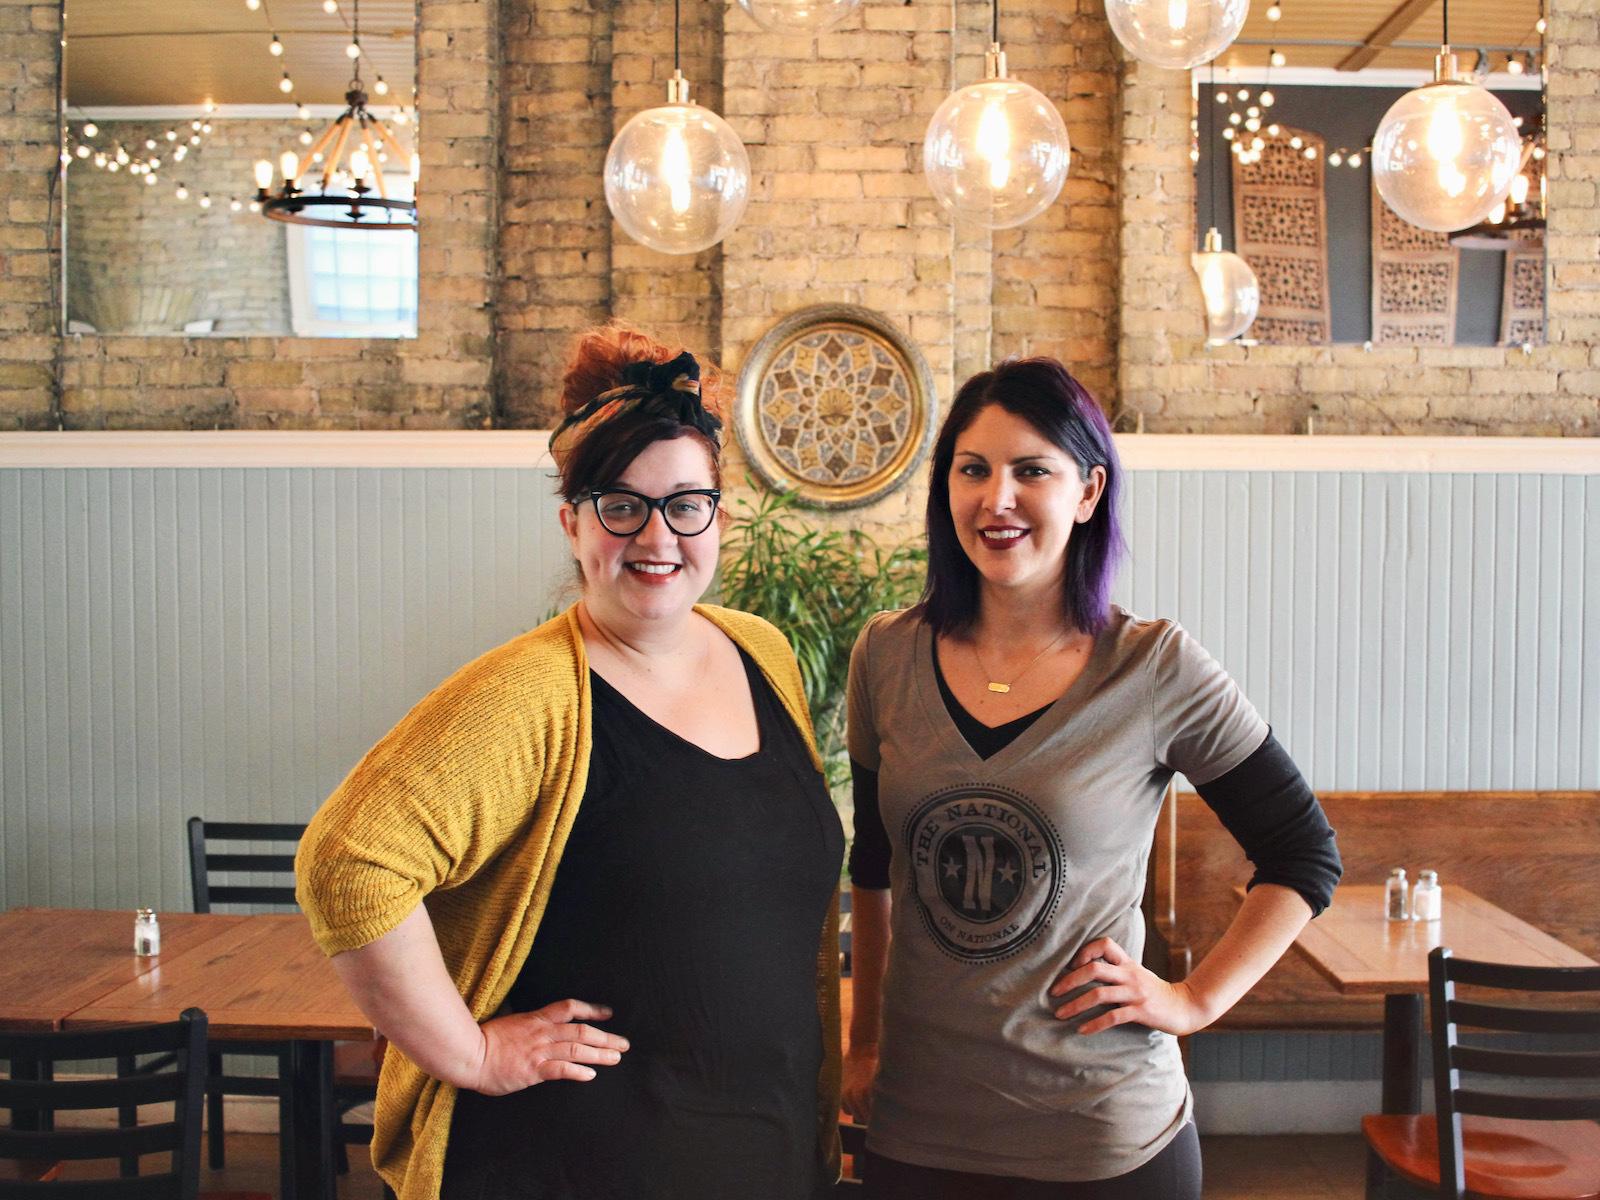 The National Cafe owners Angie Wierzbinski and Amy Plennes